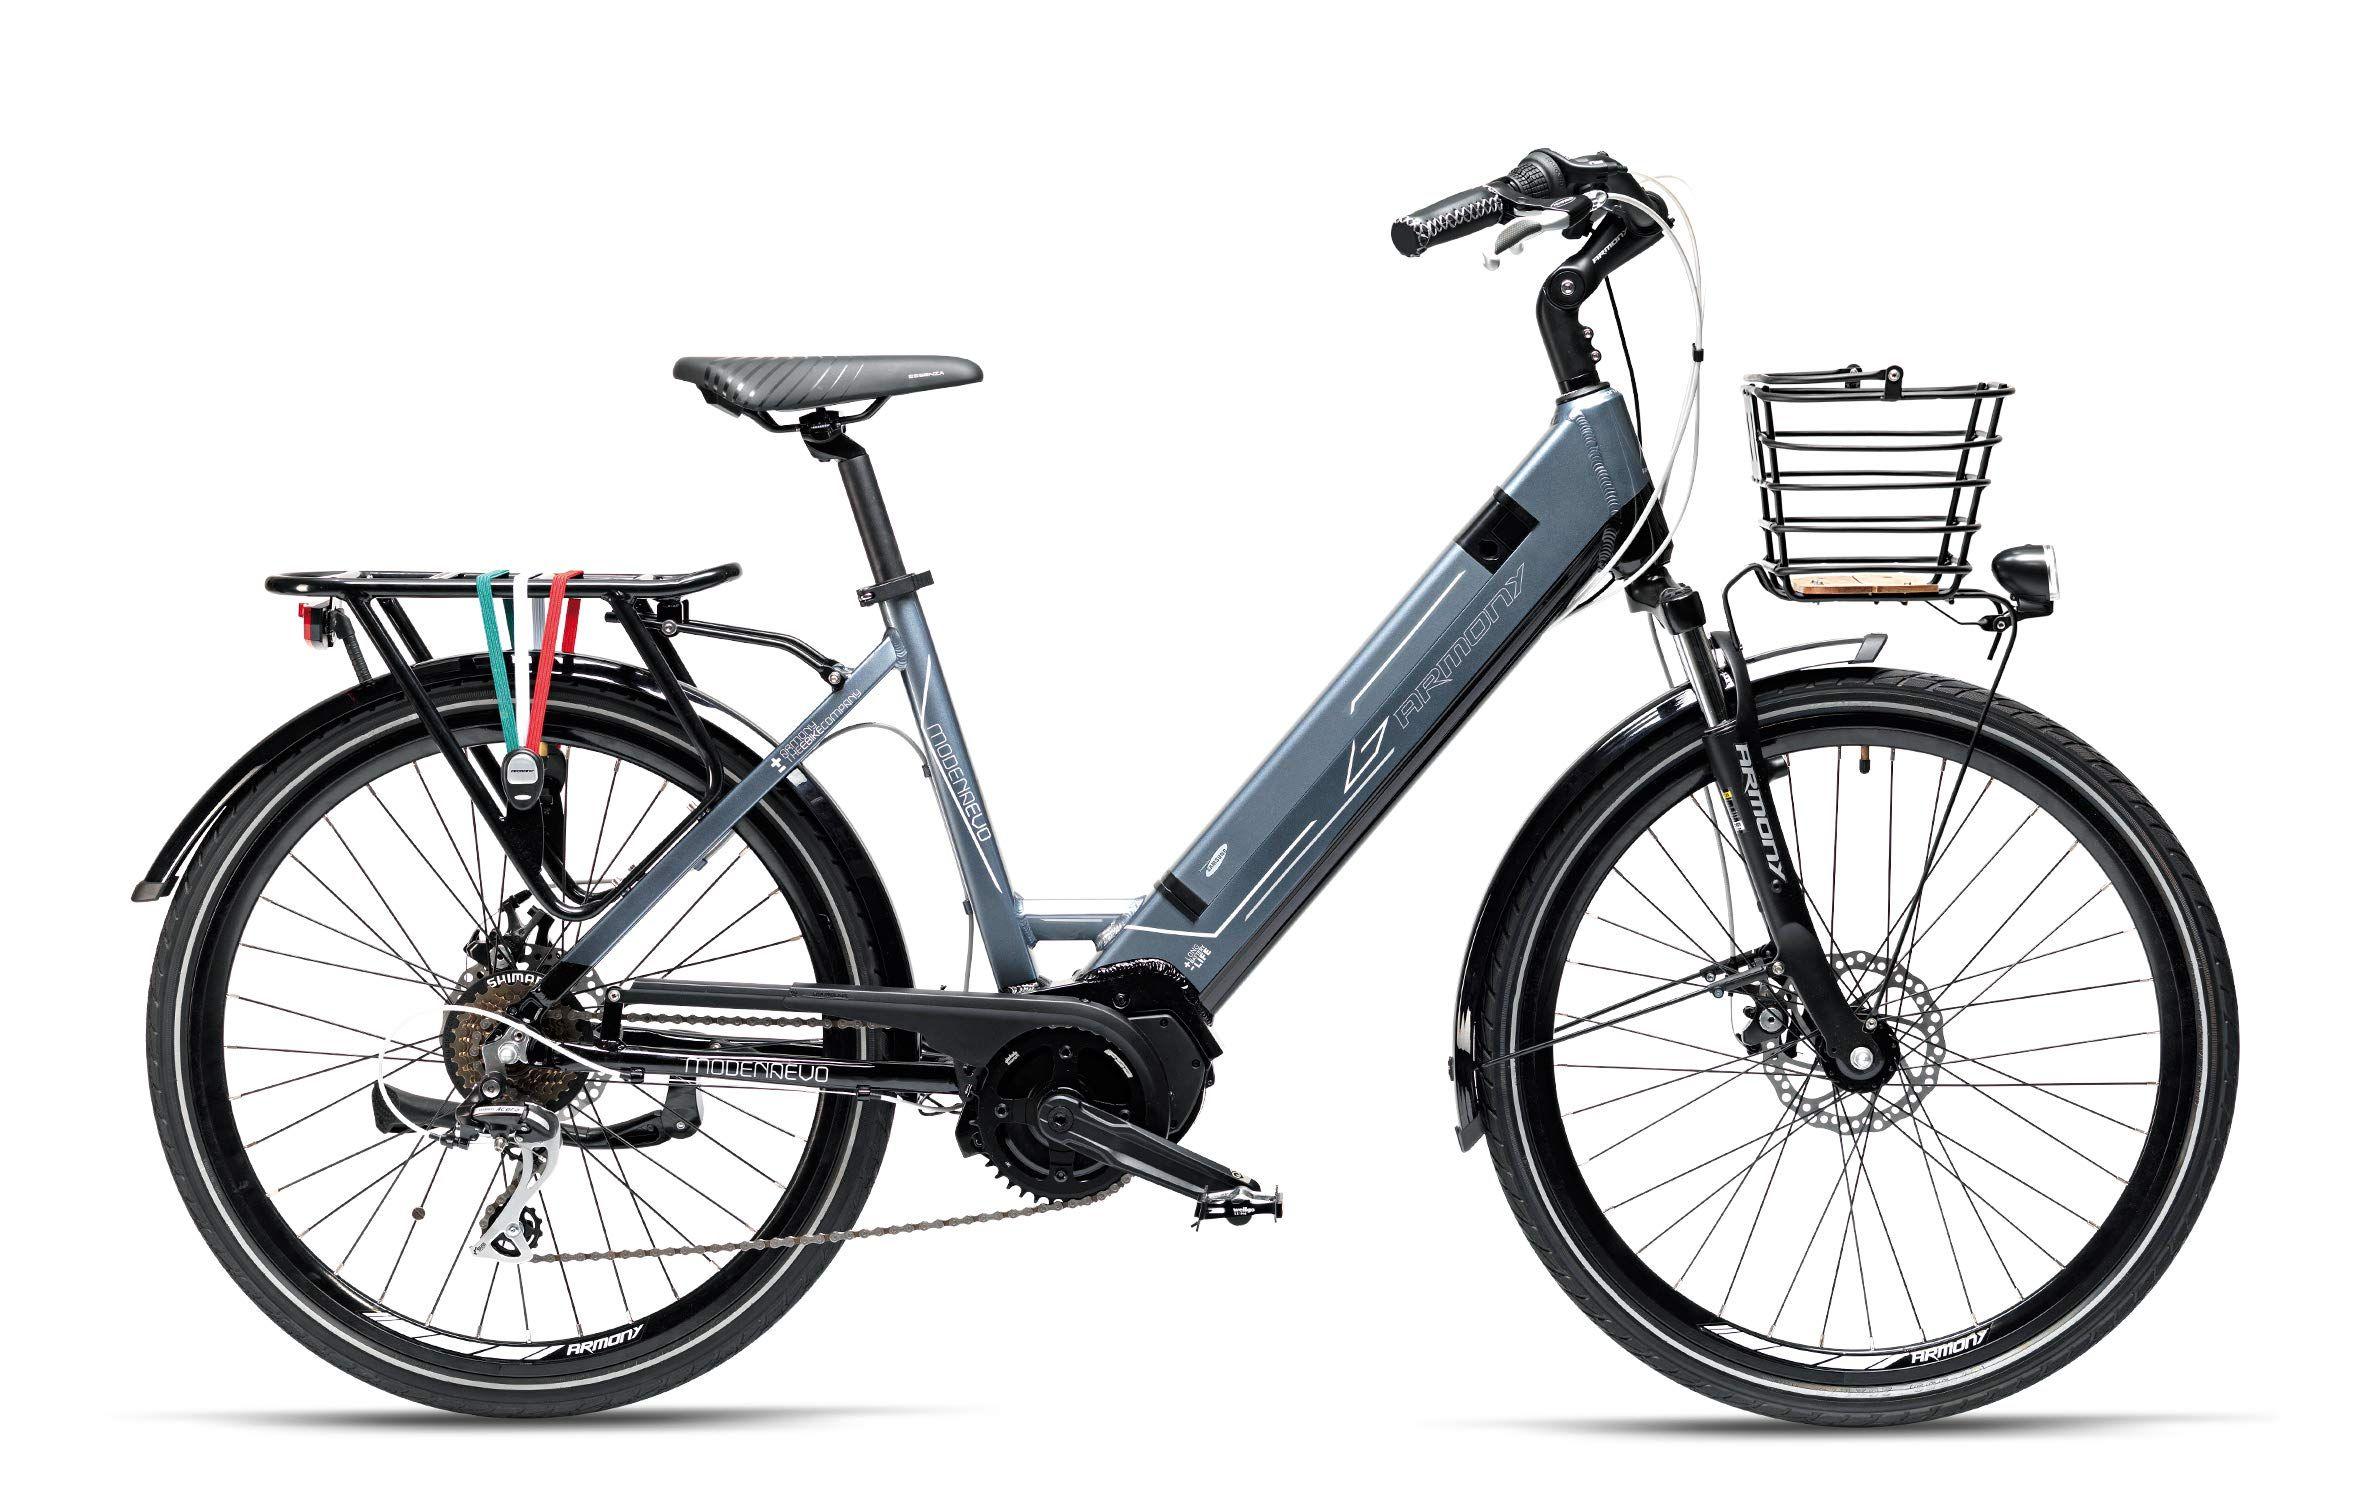 Armony Modena Evo, Bicicletta Elettrica Unisex Adulto ...